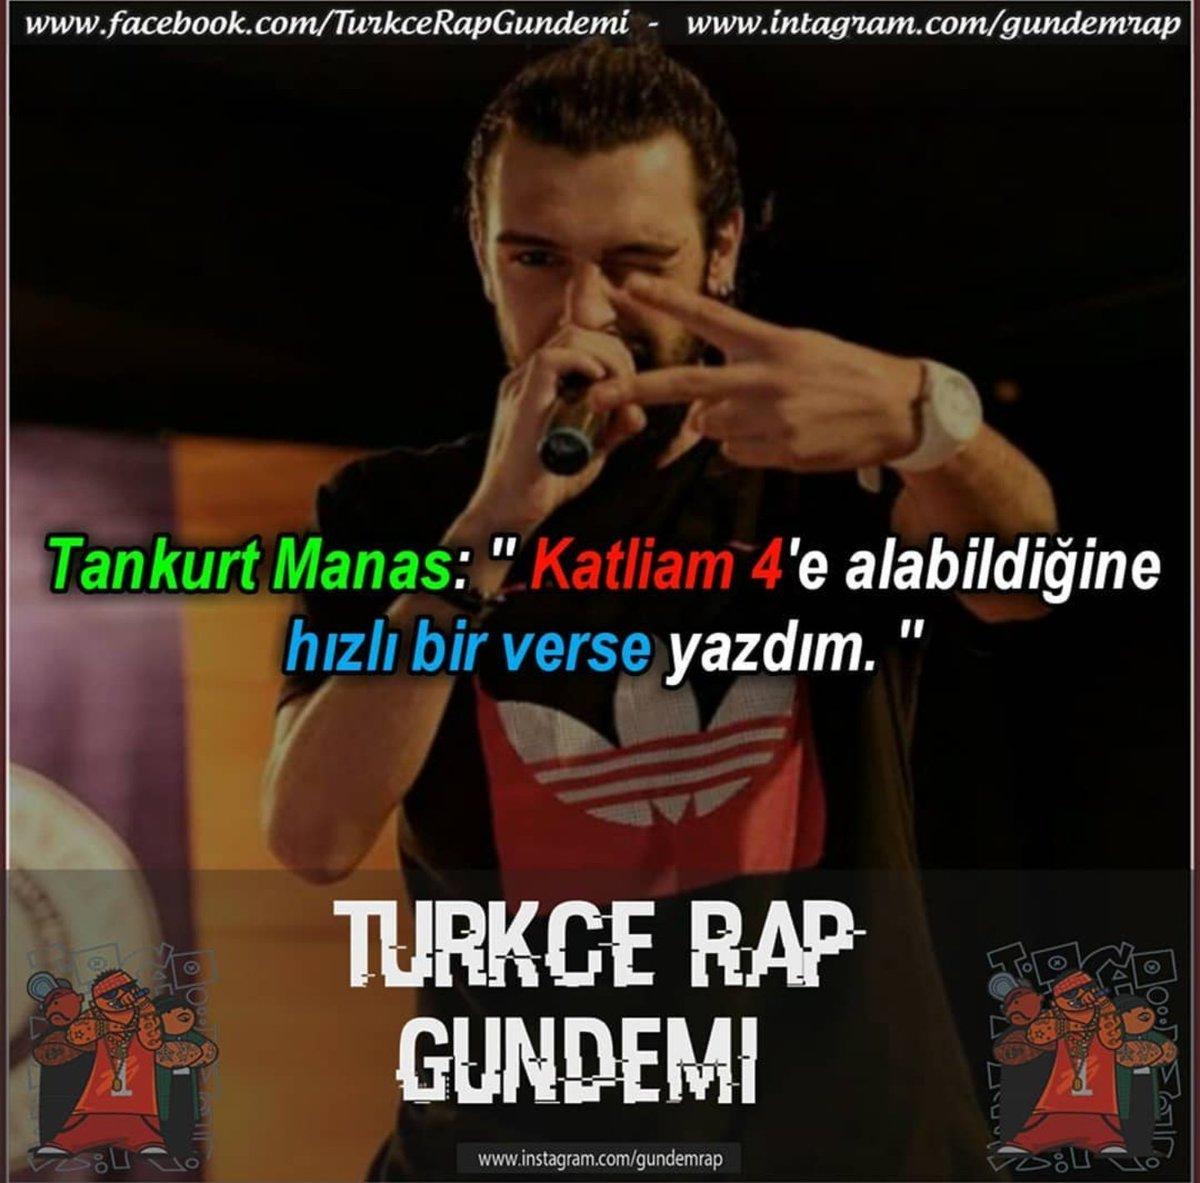 Siz bu konu hakkında ne düşünüyorsunuz...? . . . #rap #hiphop #music #istanbul #love #trap #türkçerap #instagood #müzik #beat #izmir #pop #instagram #rapper #rnb #turkey #beats #turkcerap #party #song #remix #instamusic #ankara #photooftheday #türkiye #melody #freehiphoppic.twitter.com/abs2gsCD69